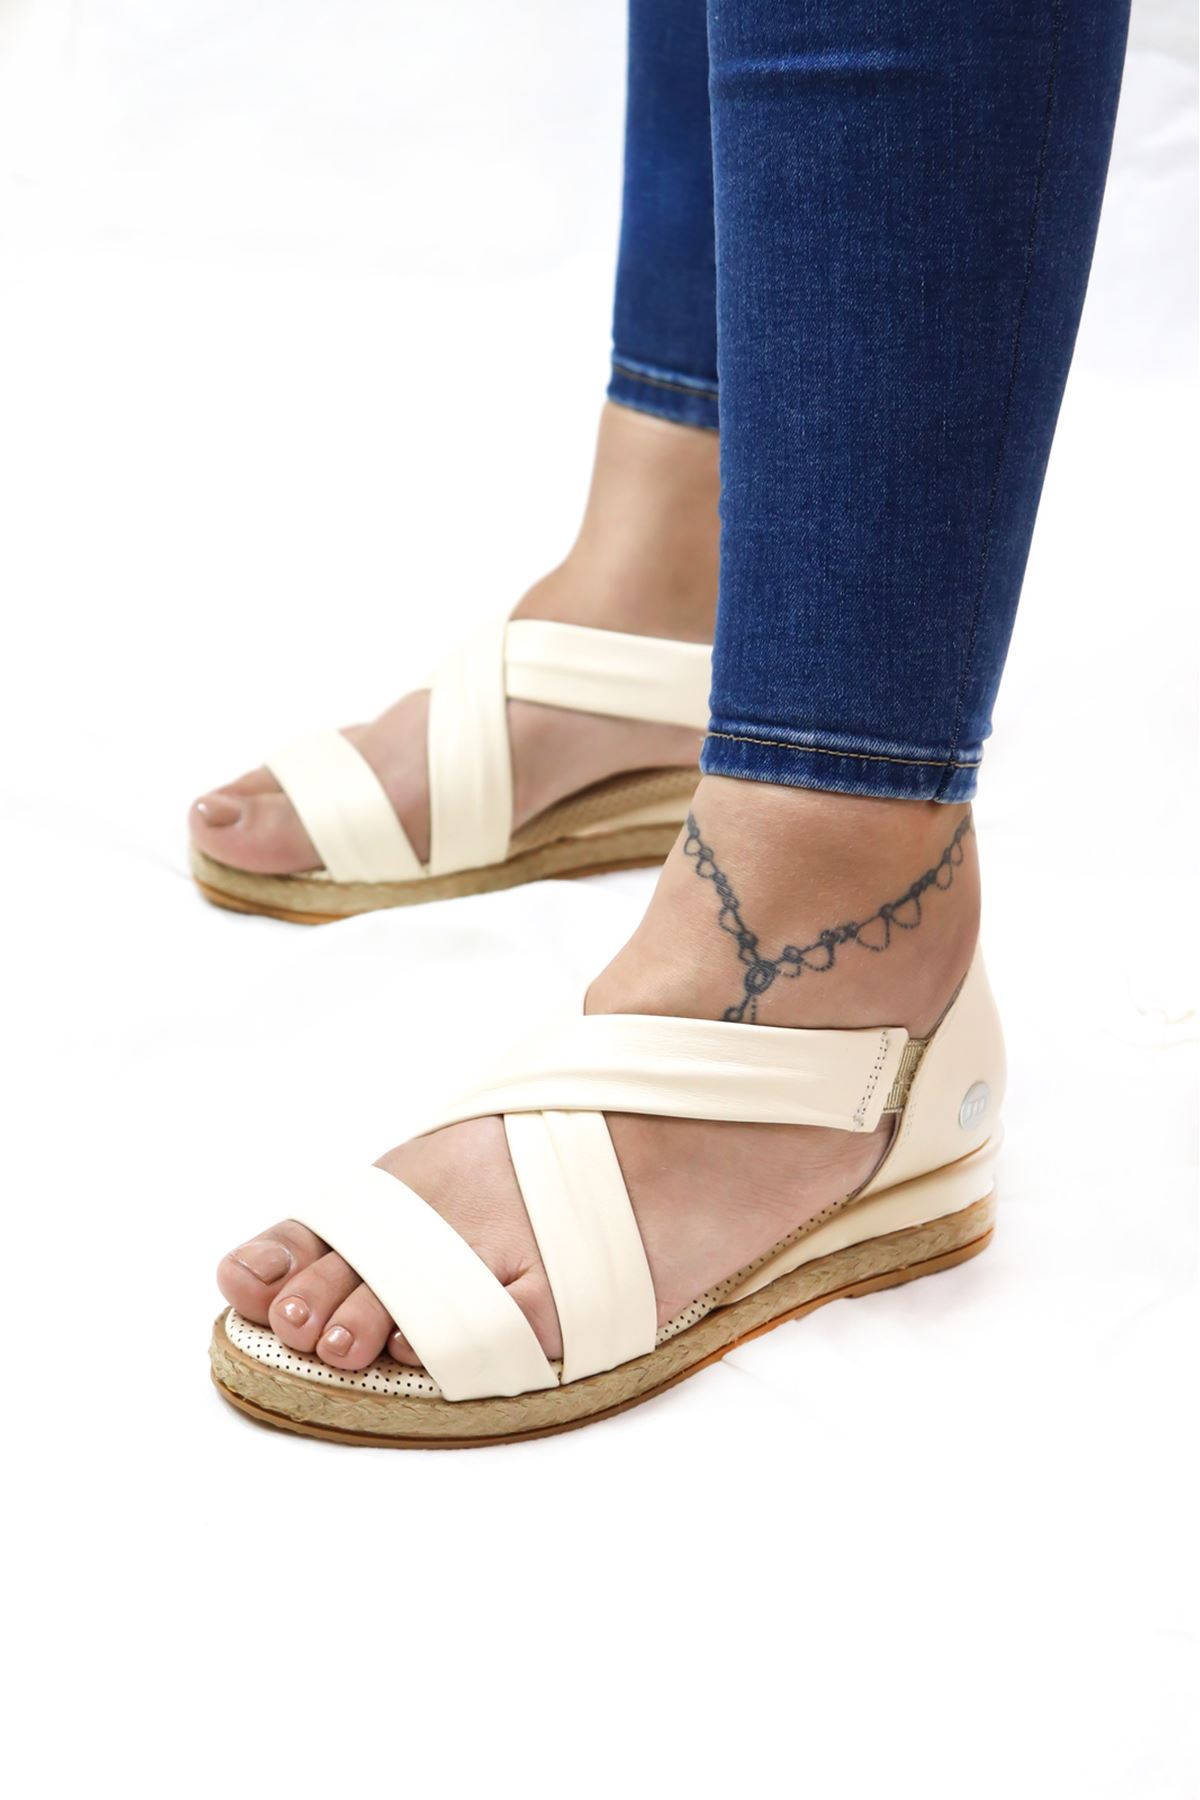 Mammamia - D21YS -1145-B Bej Kadın Sandalet